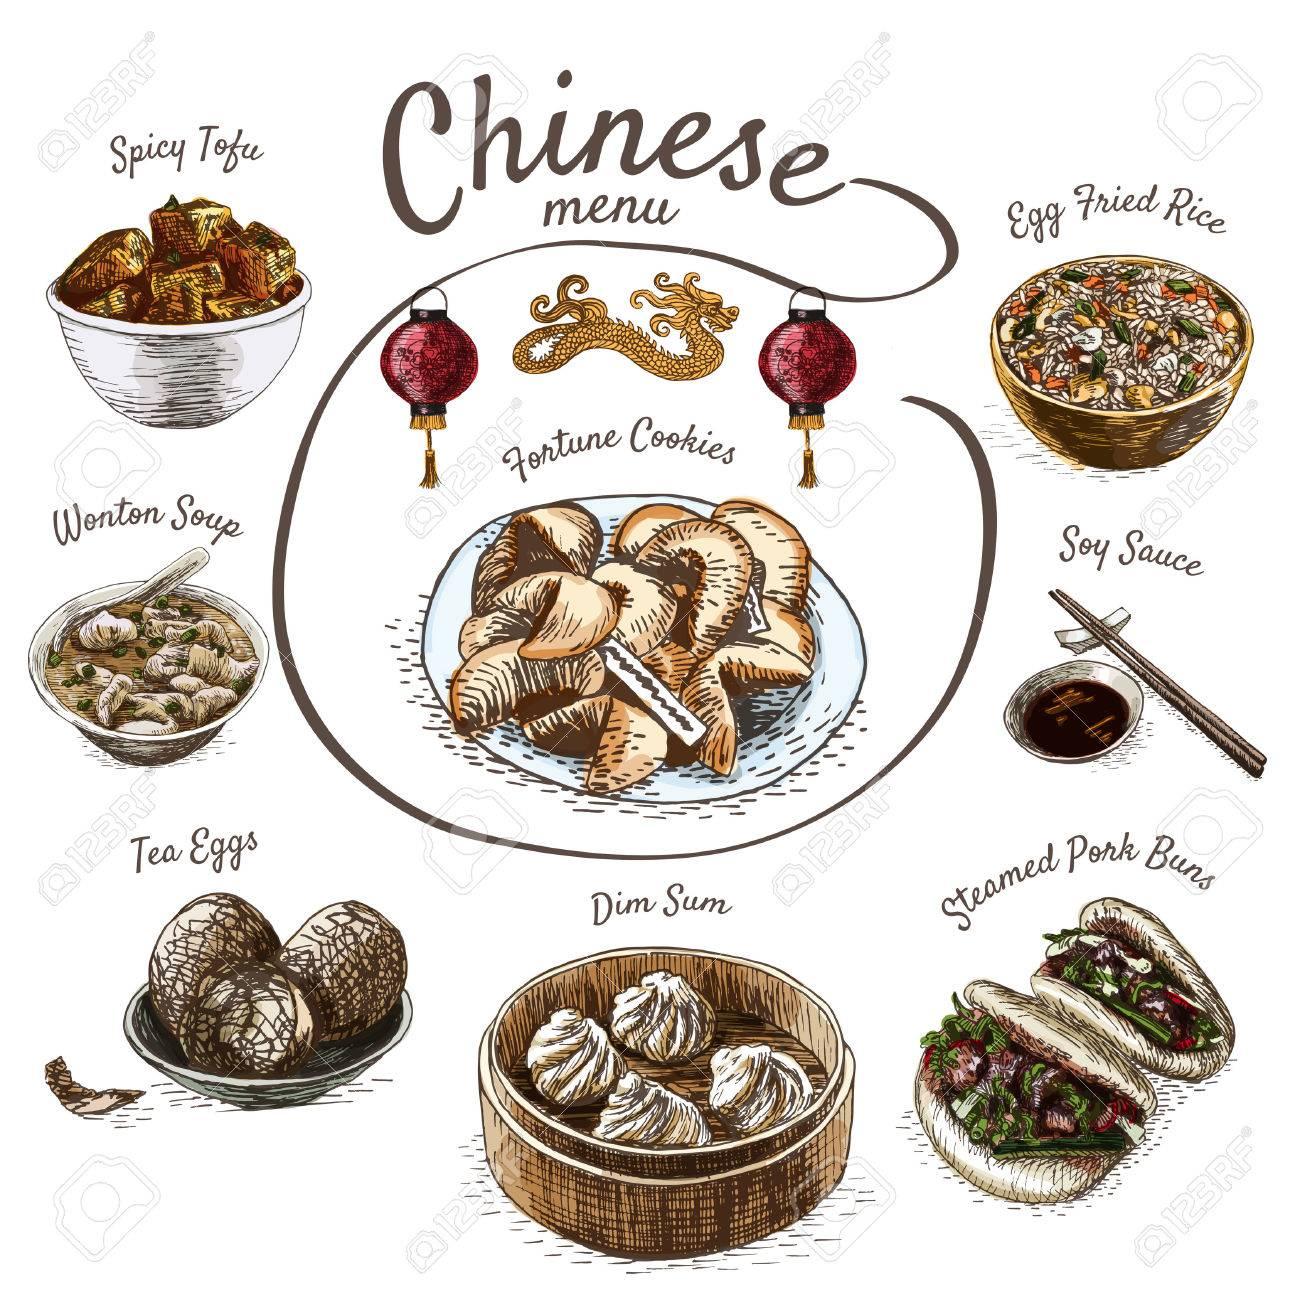 Großartig China Küche Muncie Galerie - Küchen Ideen Modern ...